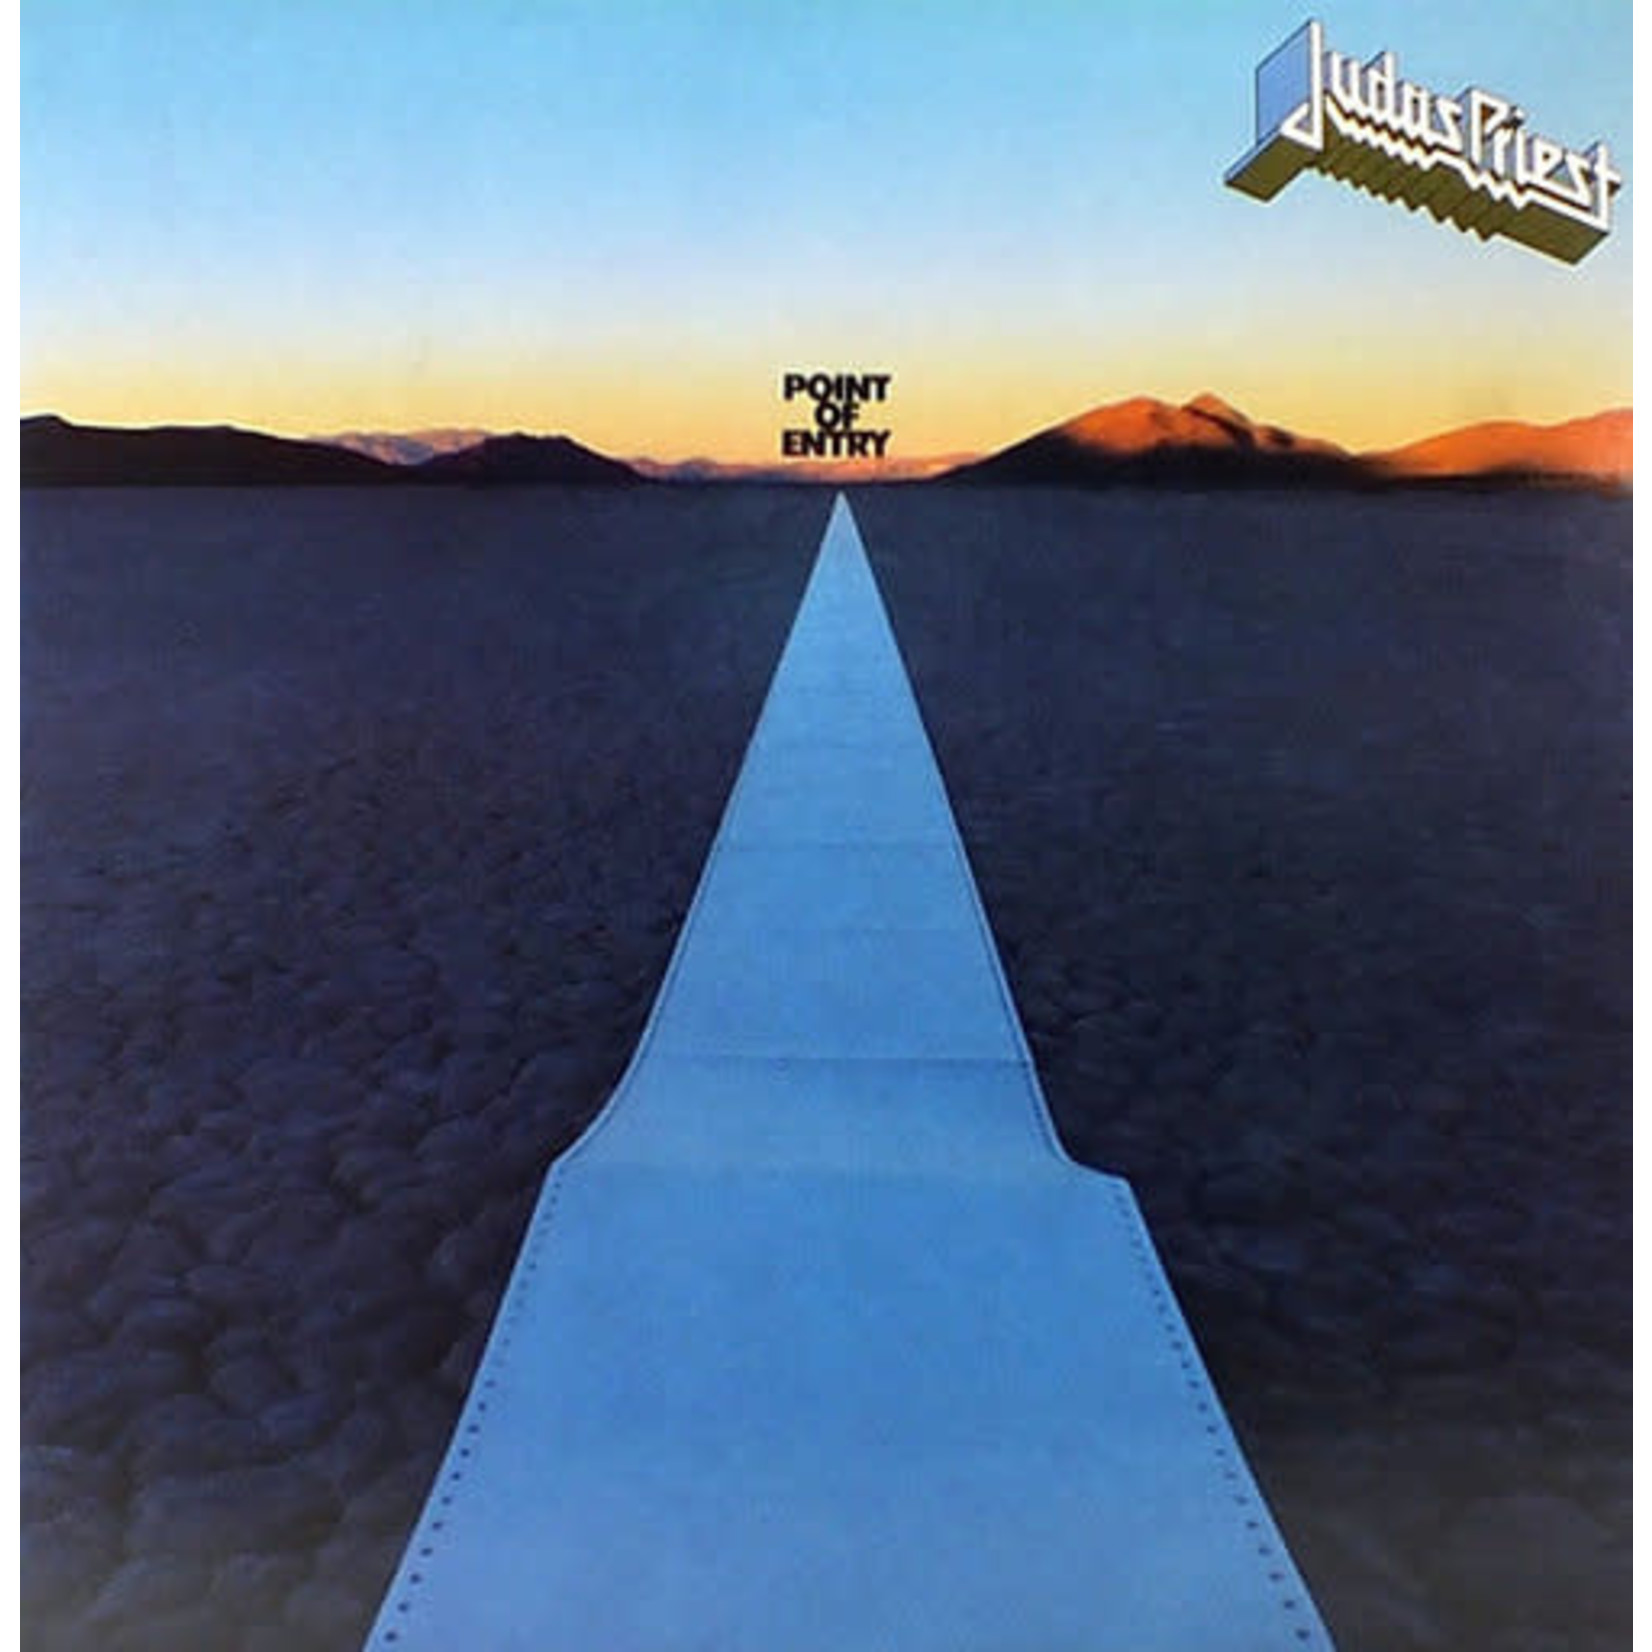 [Vintage] Judas Priest: Point of Entry